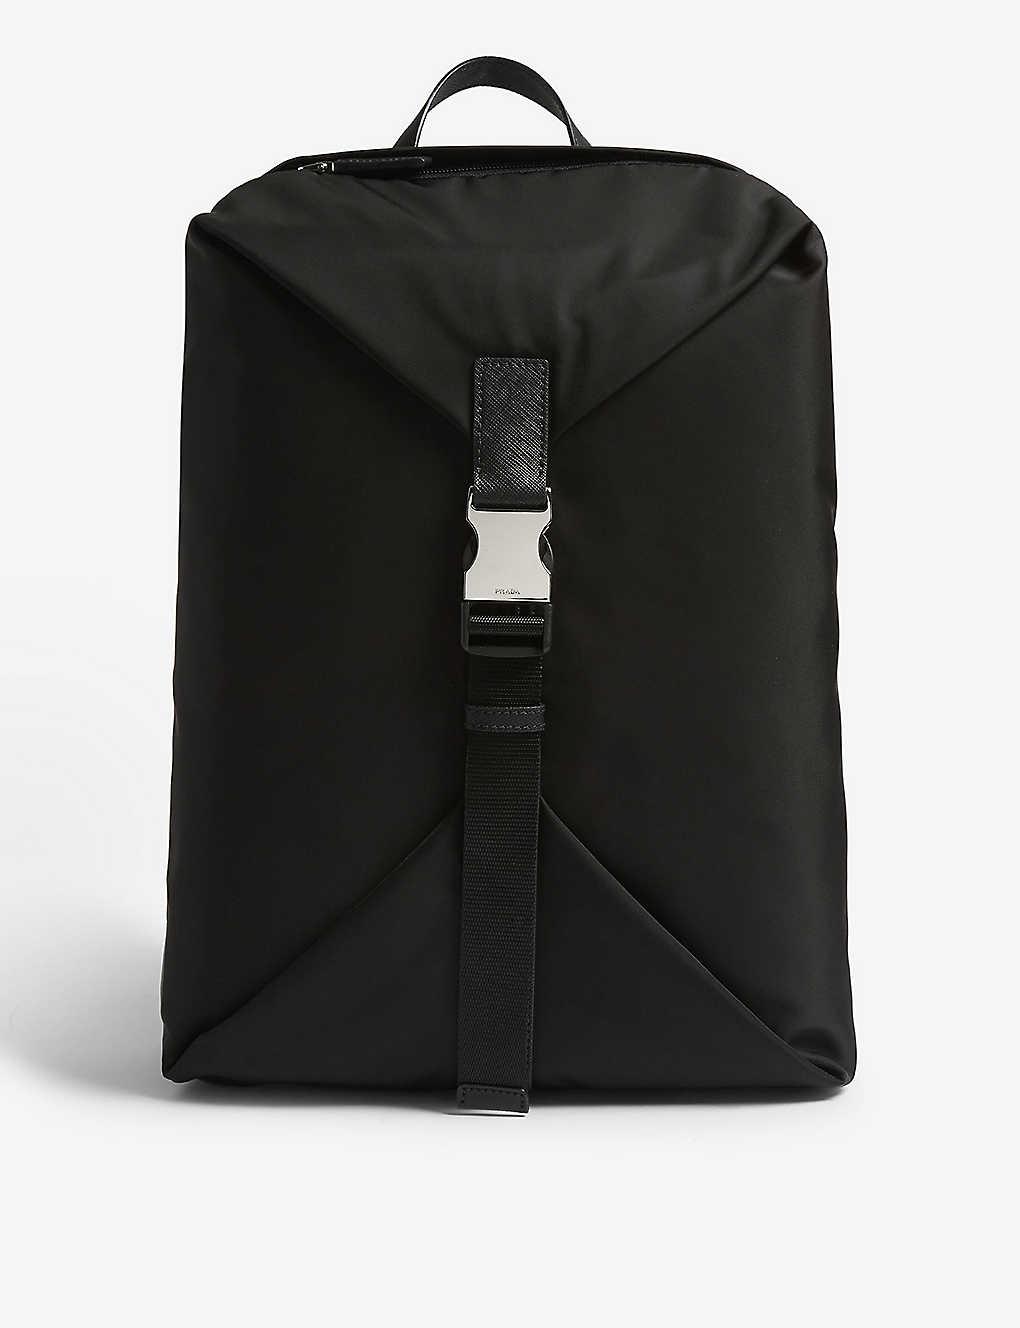 PRADA - 24hour nylon backpack  a97721e99c7eb